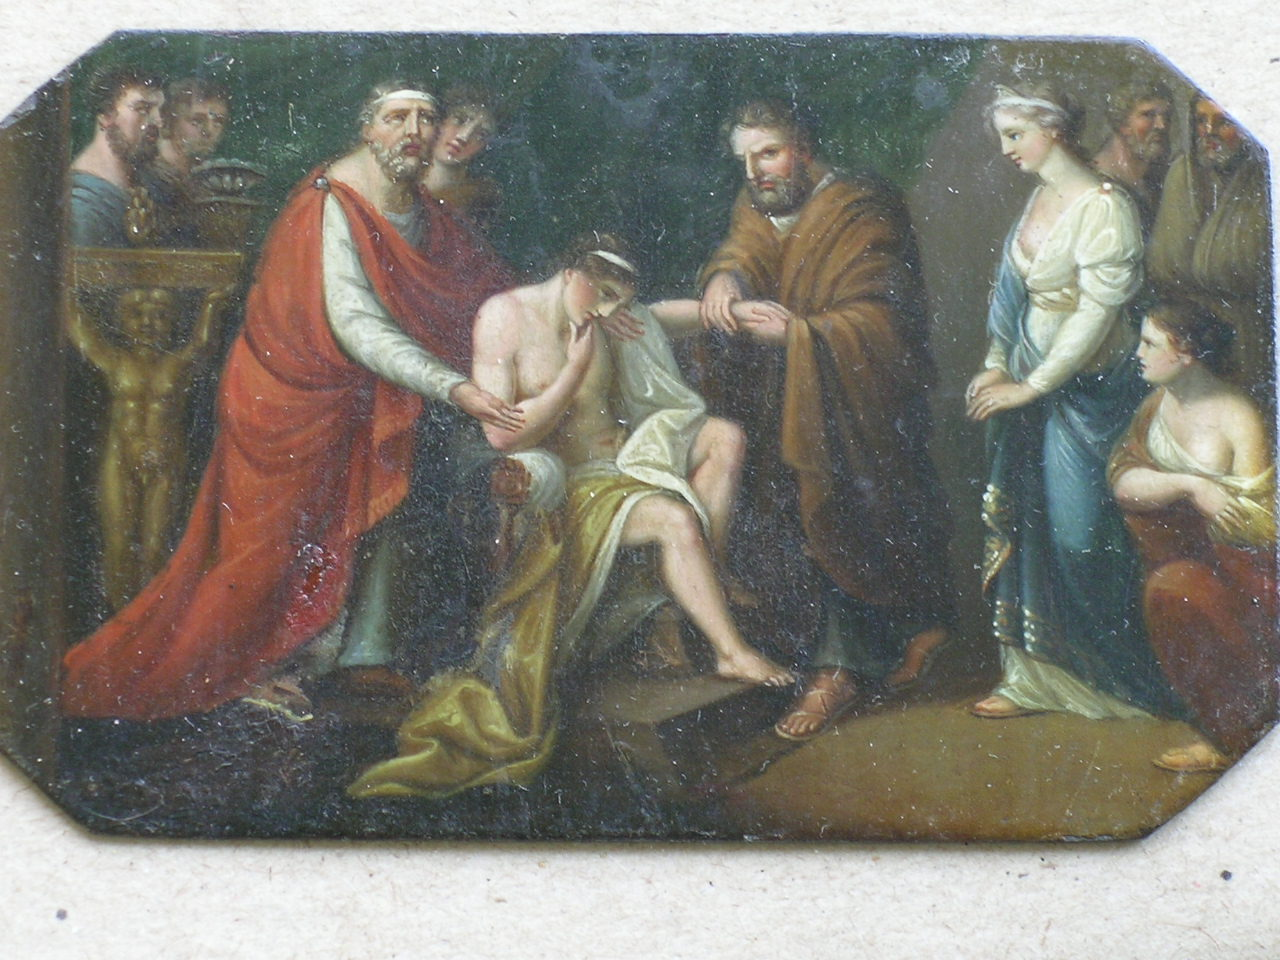 Edward'Painting - 1.jpg